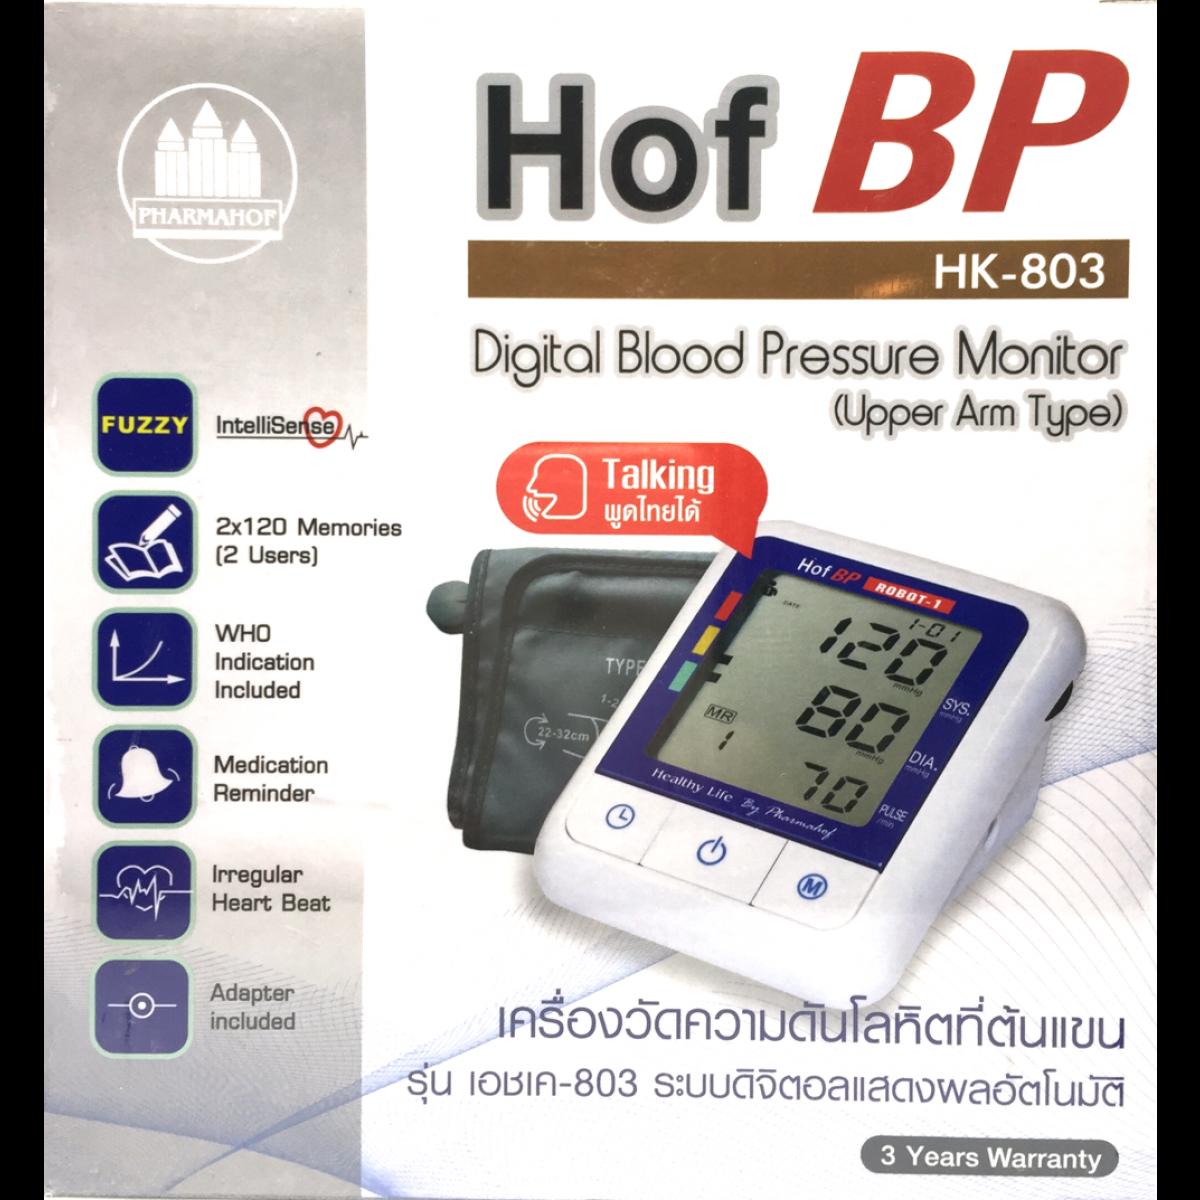 Hof BP เครื่องวัดความดัน รุ่นพูดไทยได้ HK-803